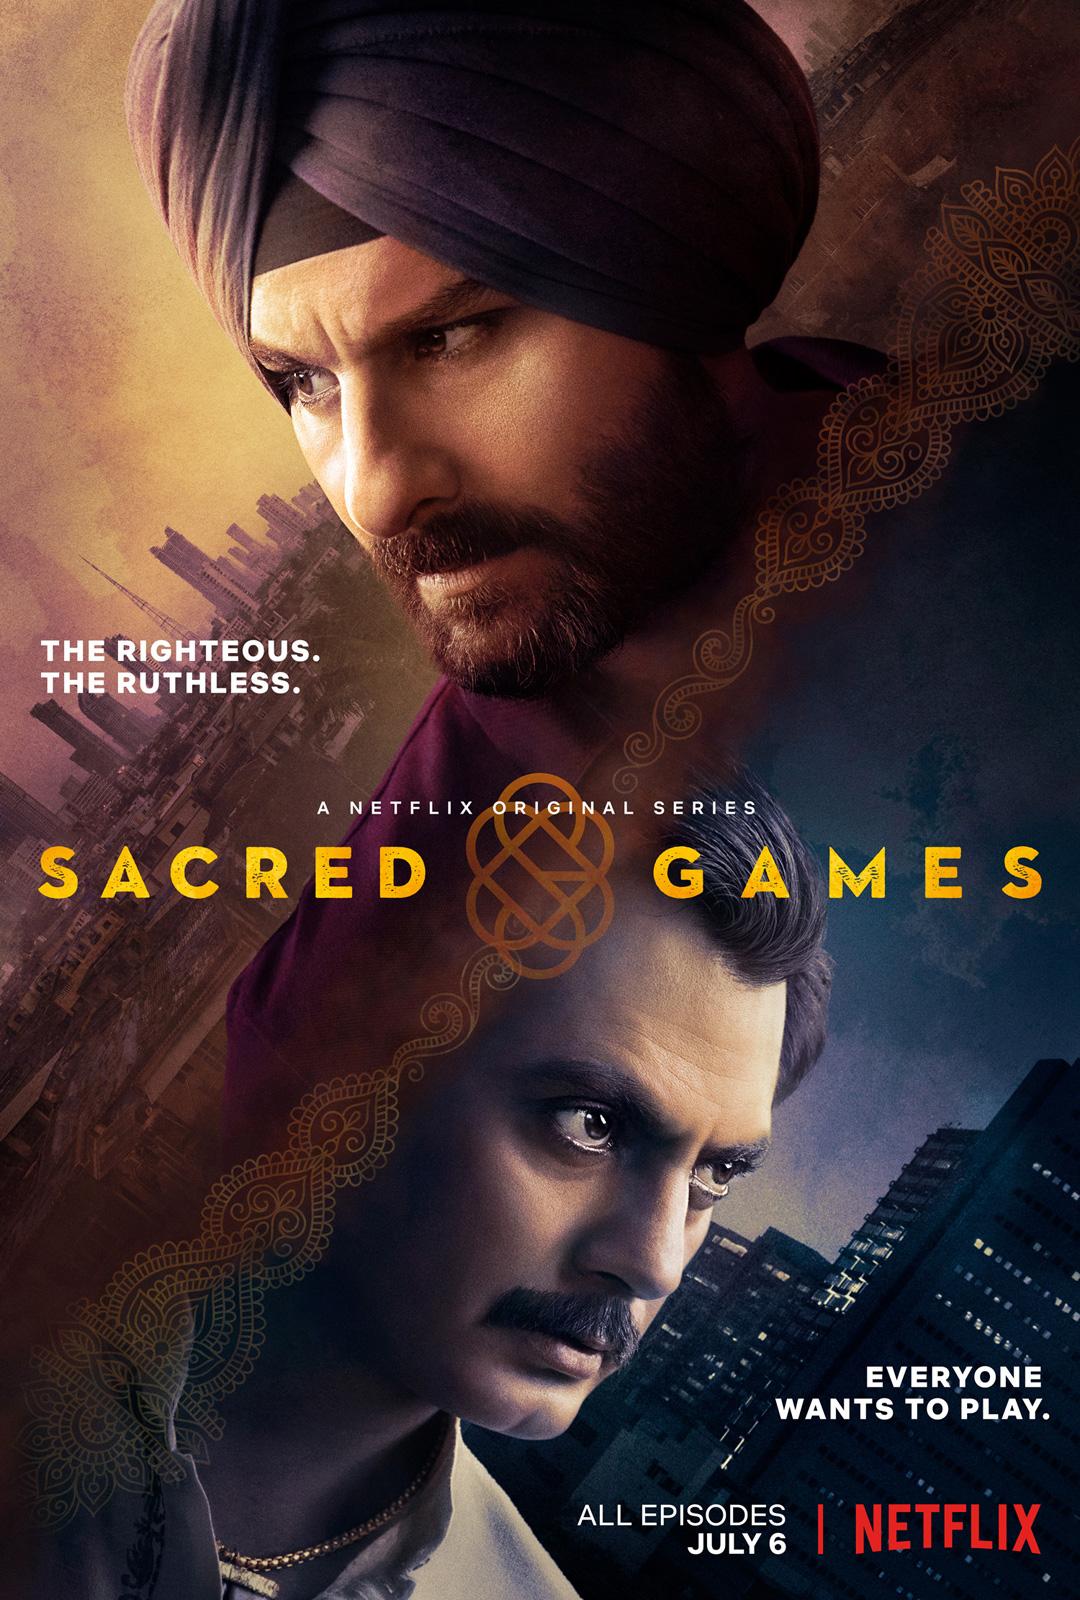 Netflix sacred games nawazuddin siddiqui amp rajshri deshpande - 3 7